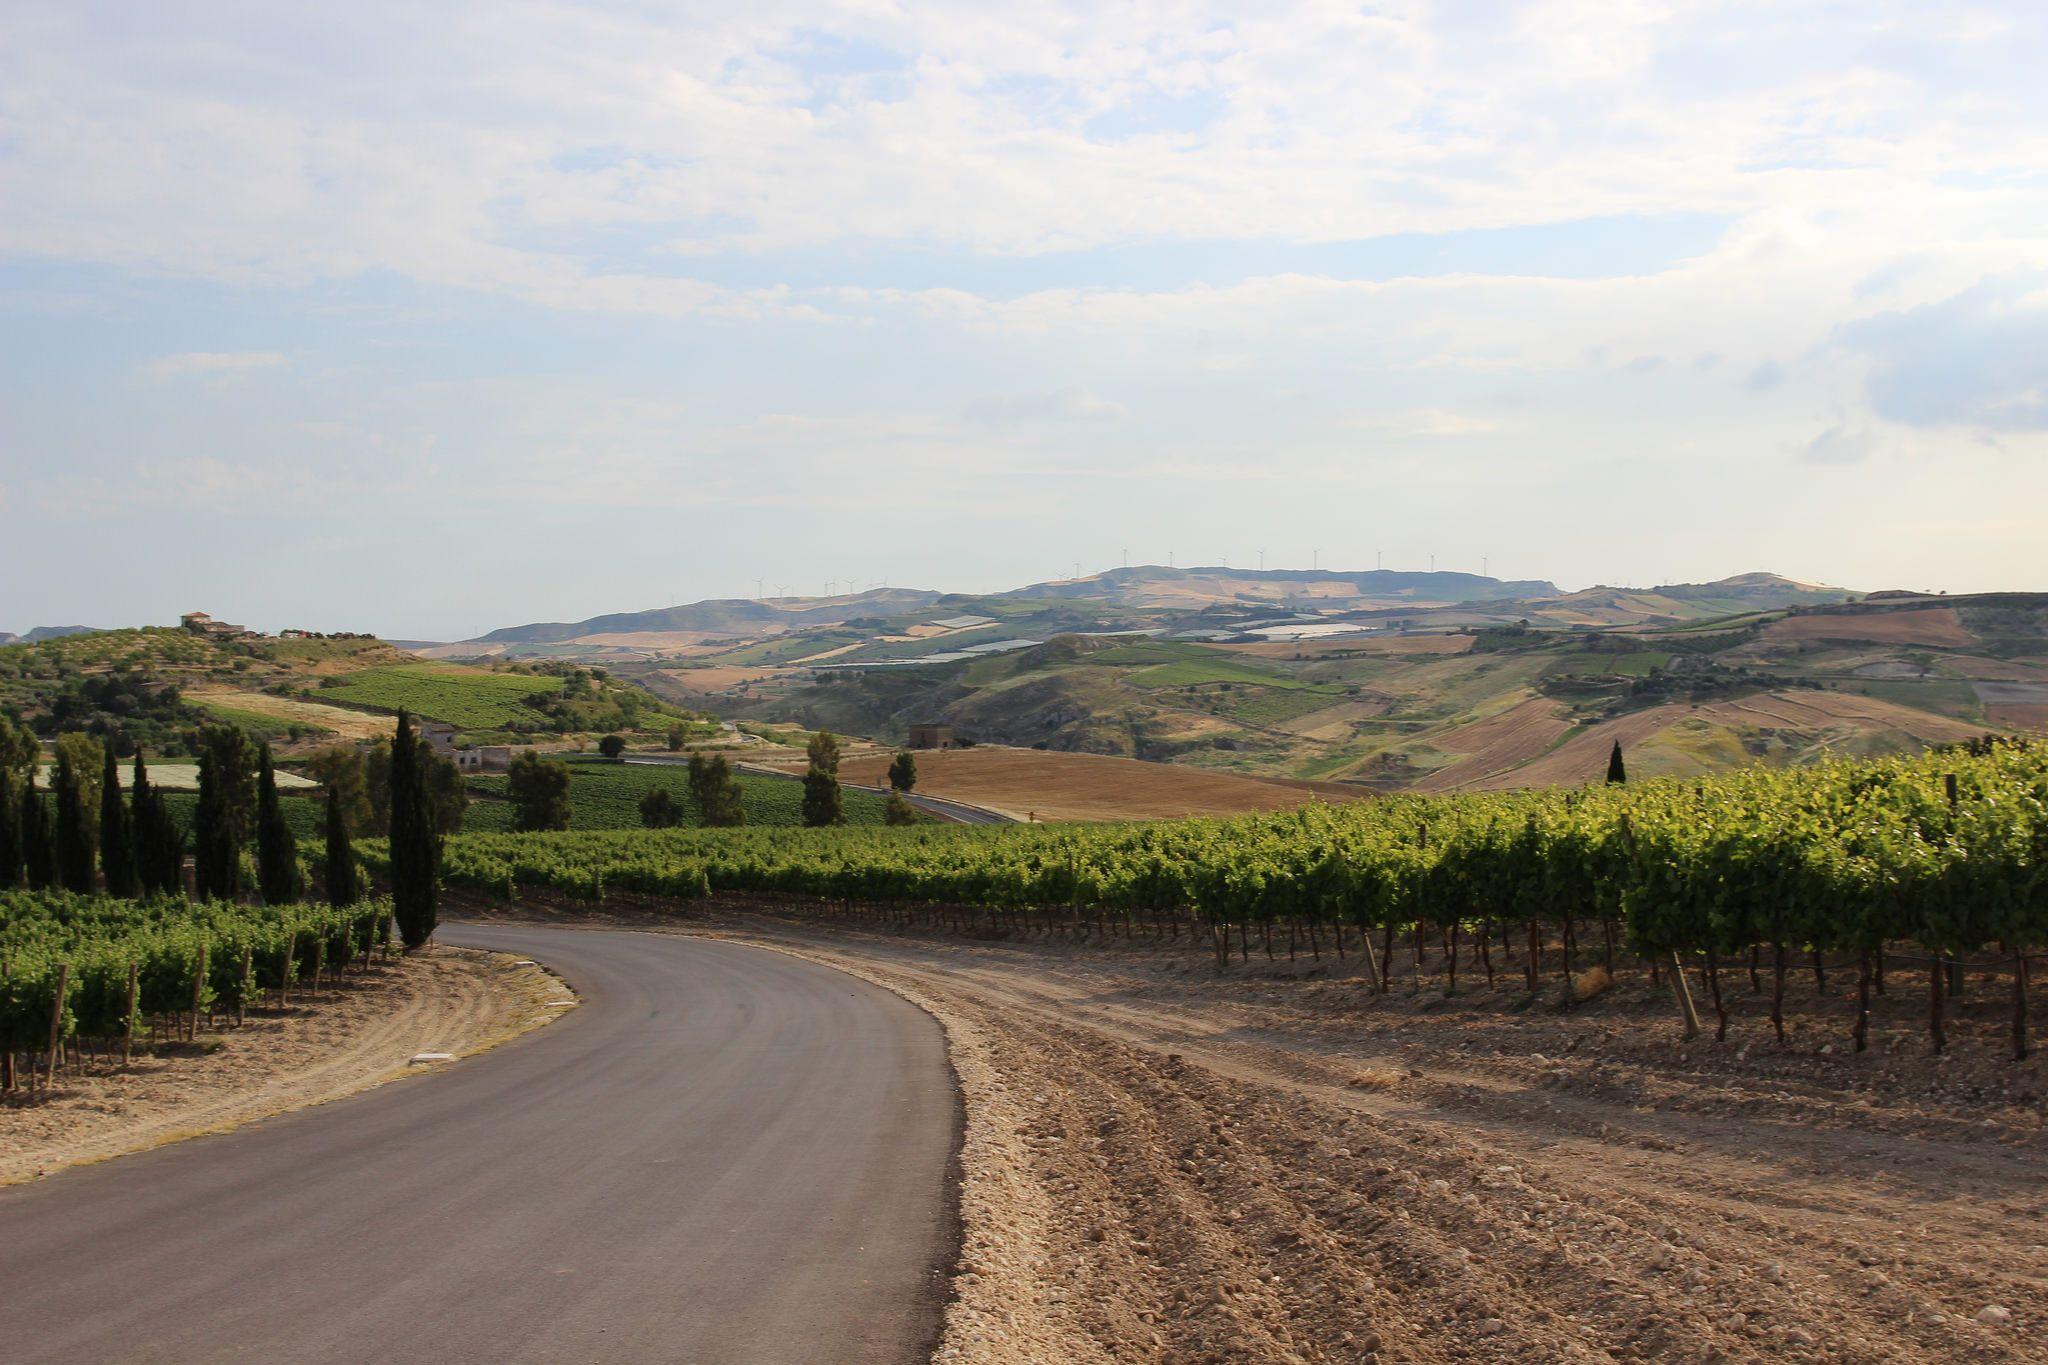 https://flic.kr/p/tM7vRA | IMG_2406 | © Amy Carlisle I Cristo di Campobello vineyard, Sicily.